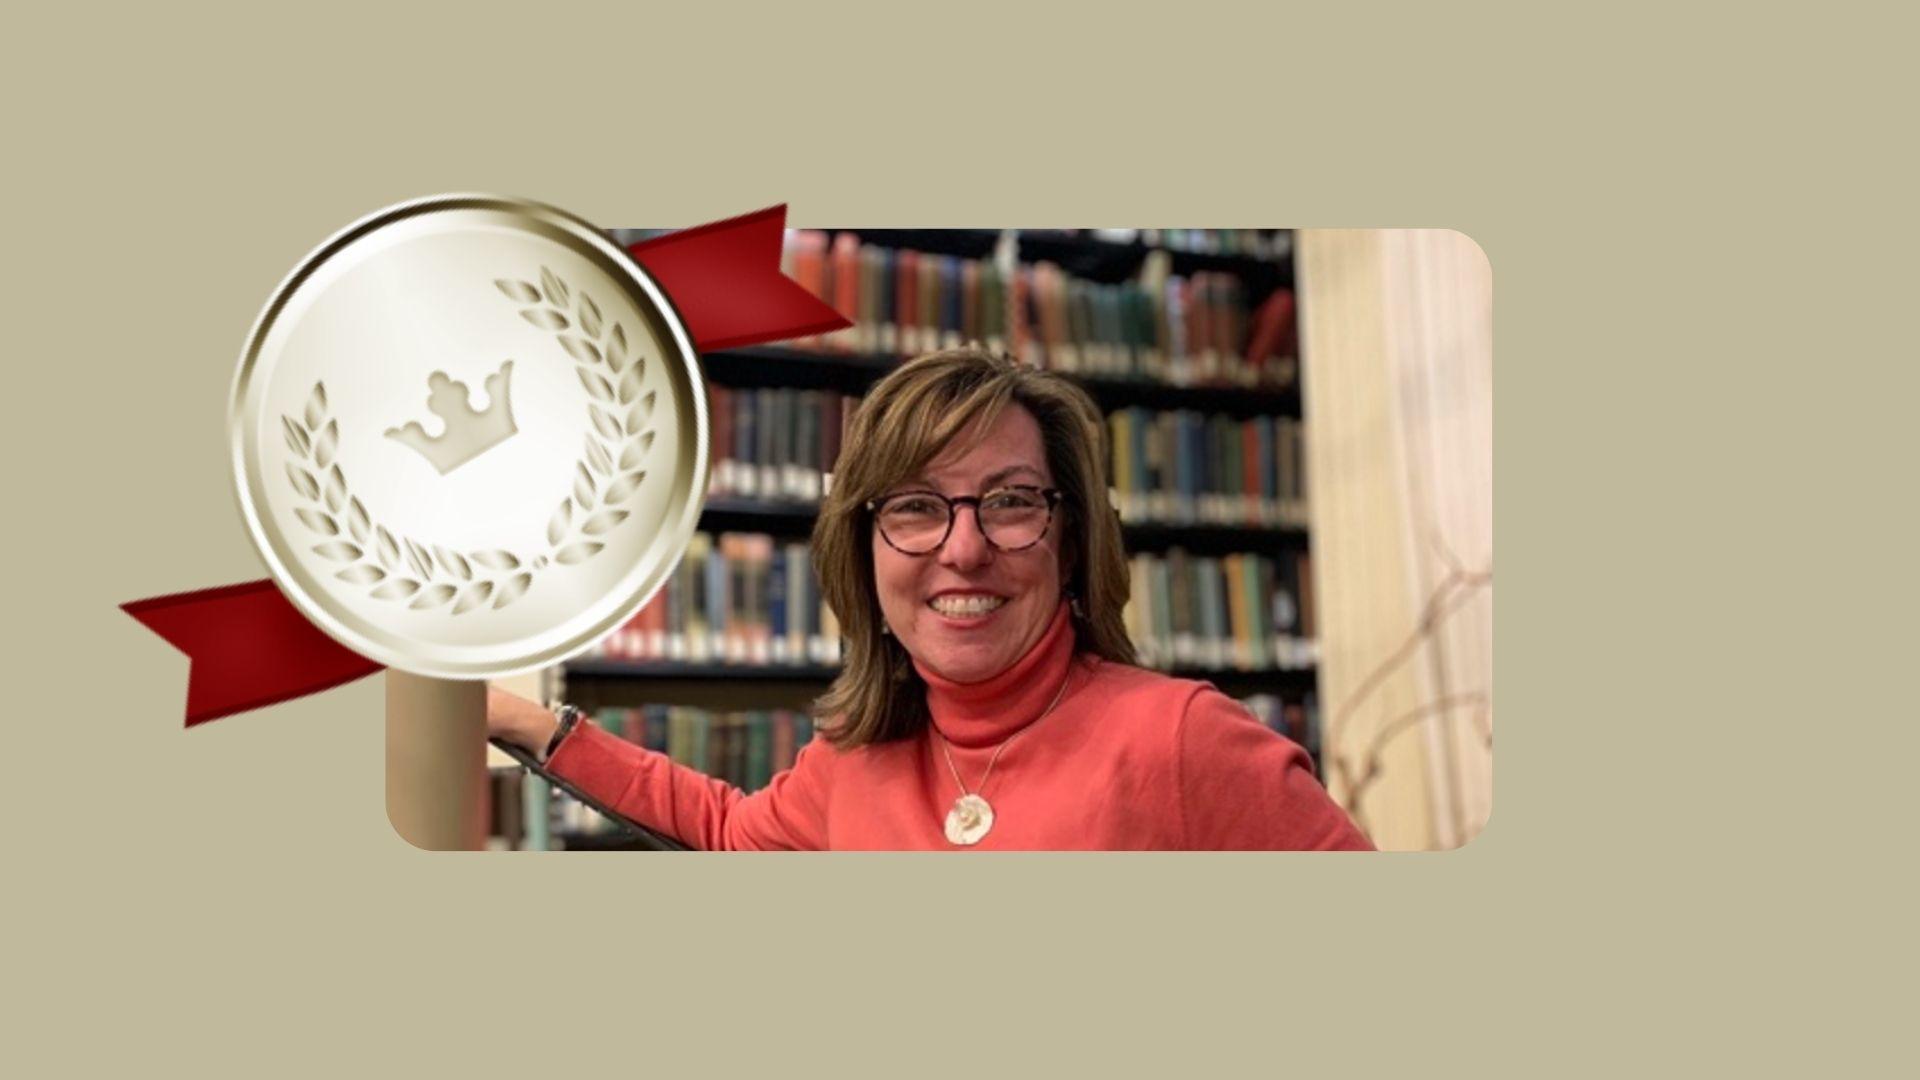 Meet the 2020 Leadership Trailblazer Award Winner: Vanessa Donovan Hale